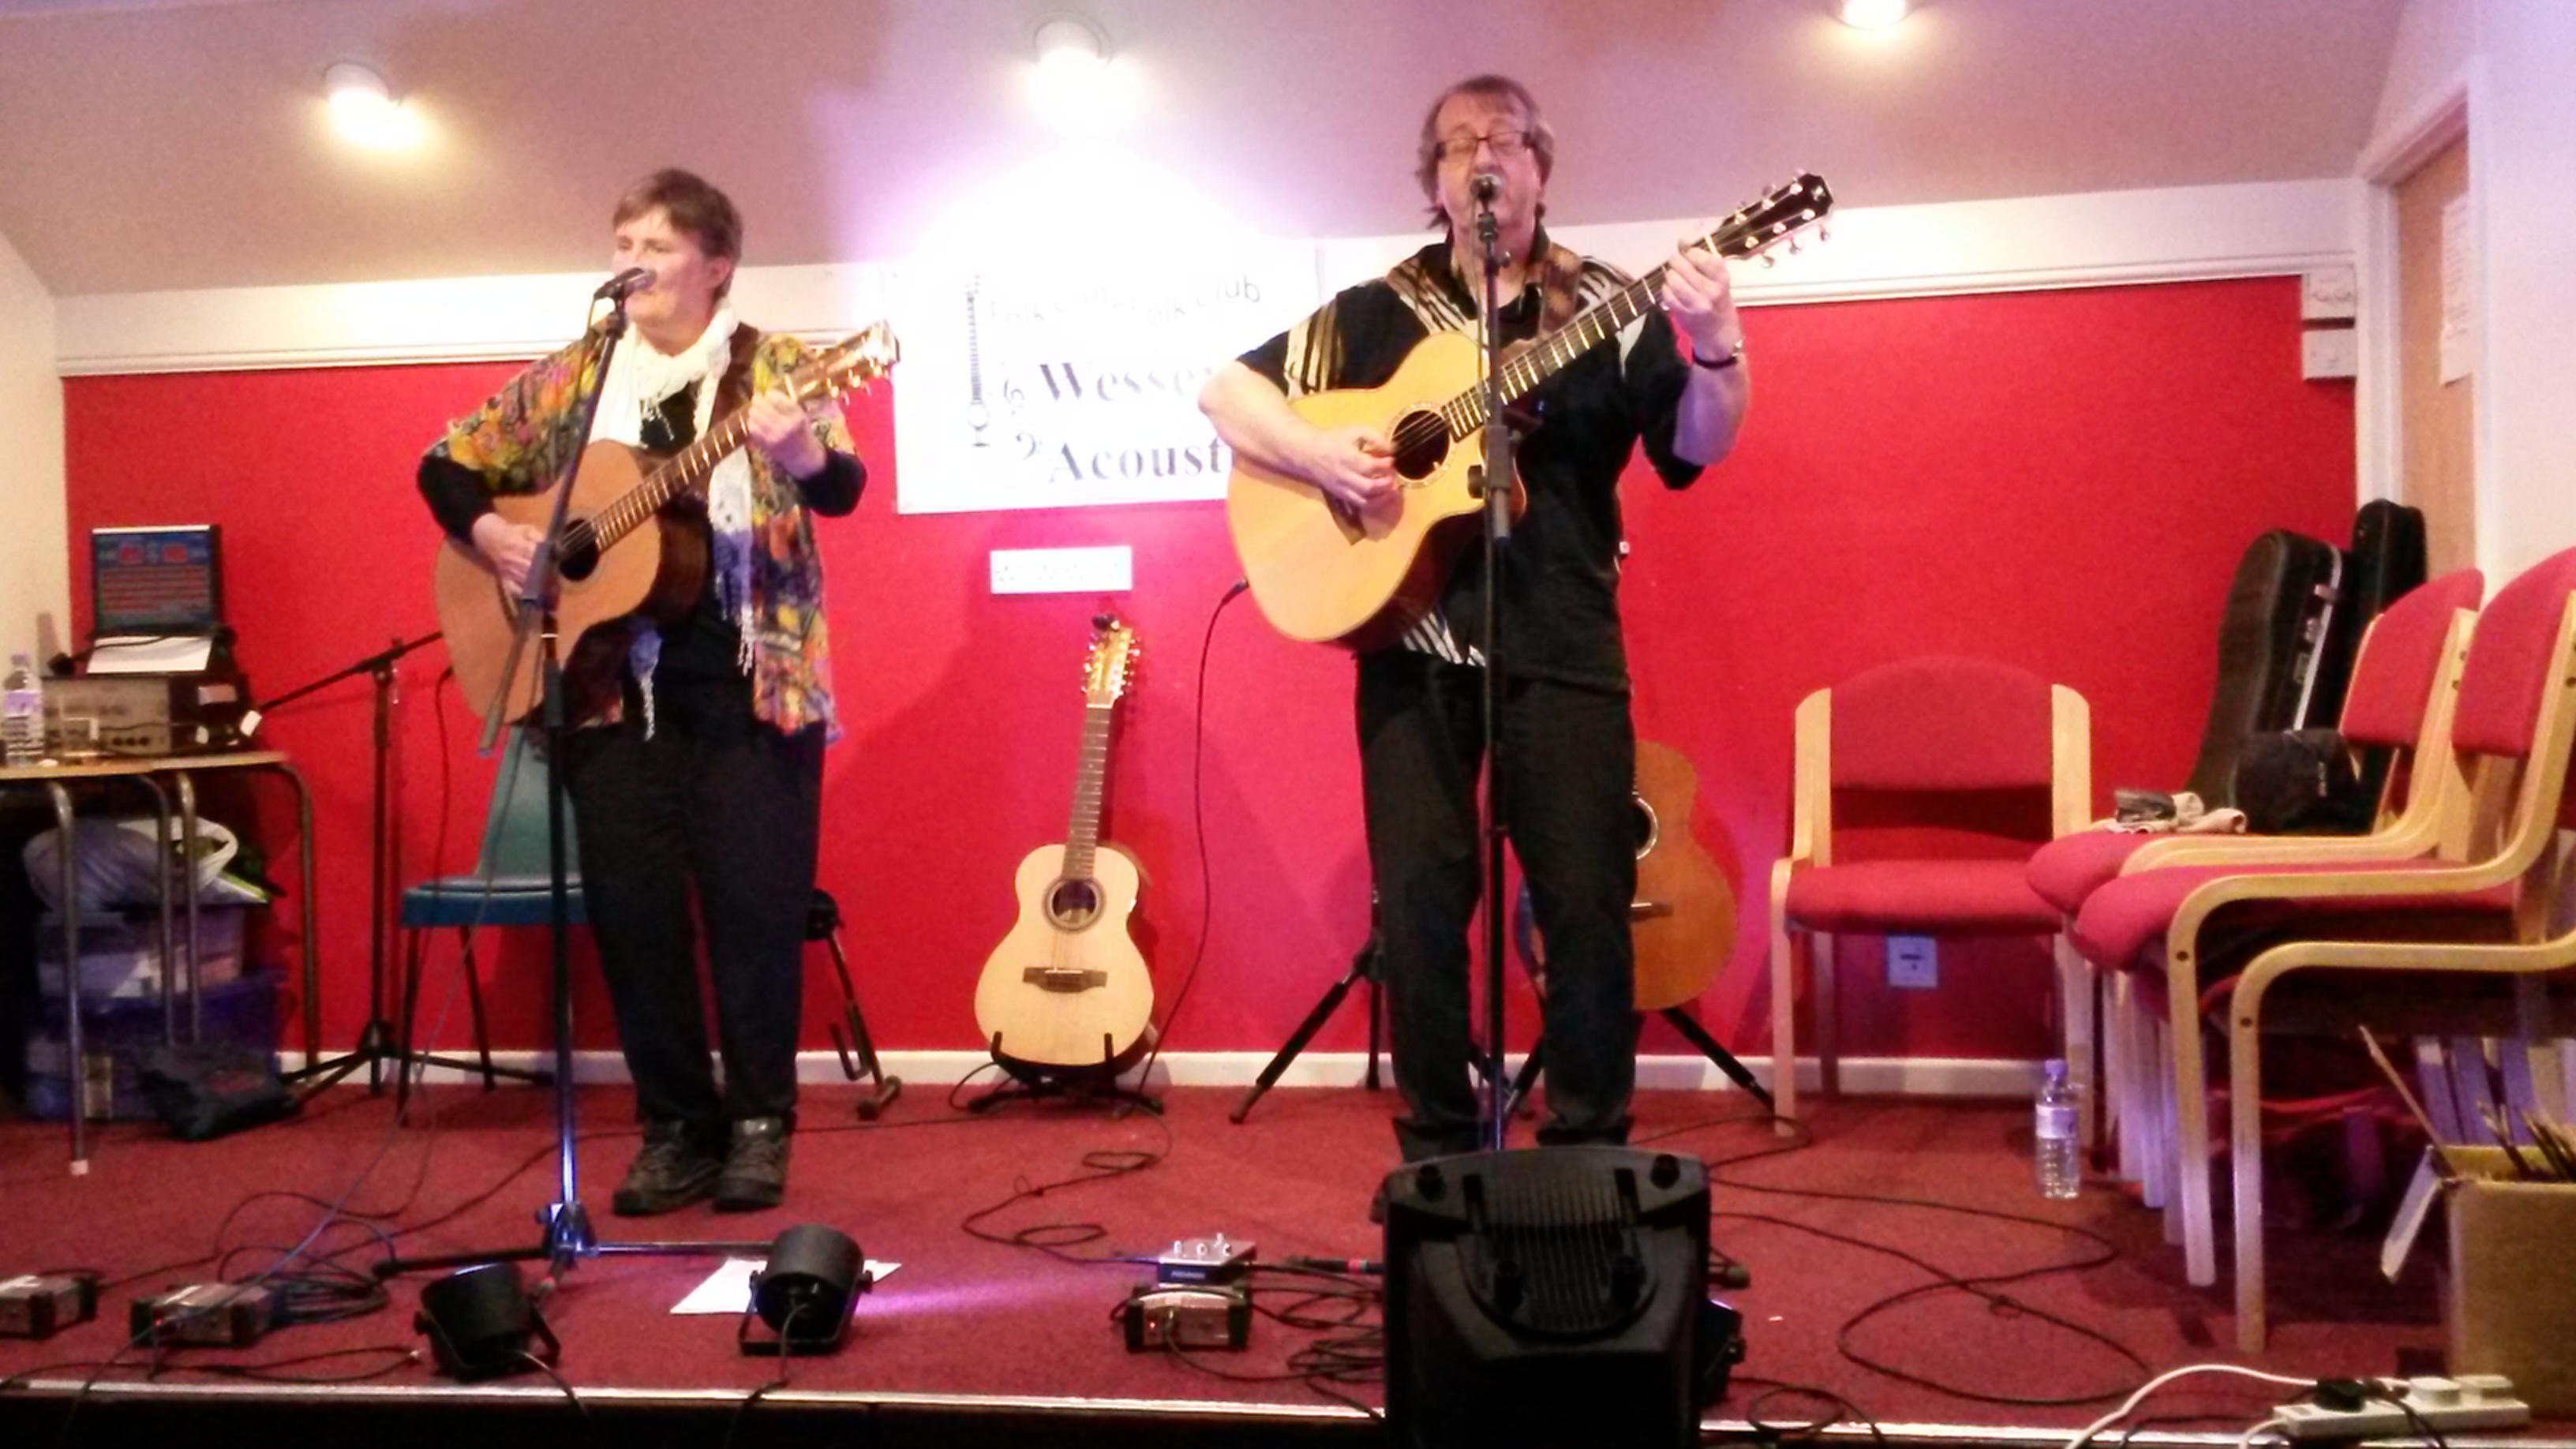 Wessex Acoustic